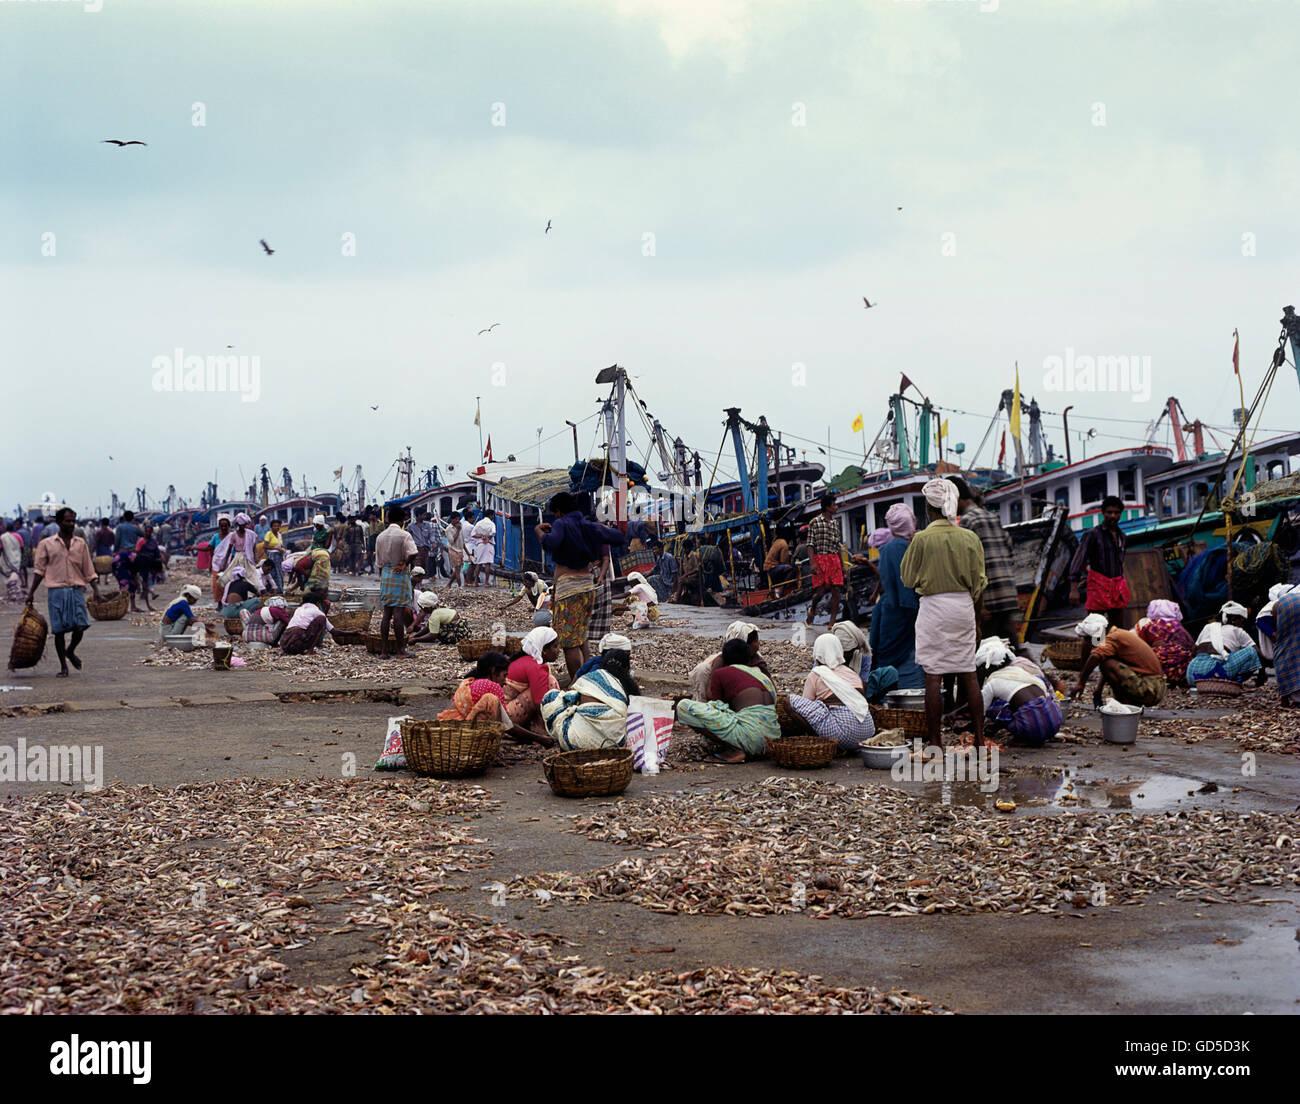 Ashtamudi Lake: Quilon Stock Photo, Royalty Free Image: 111372791